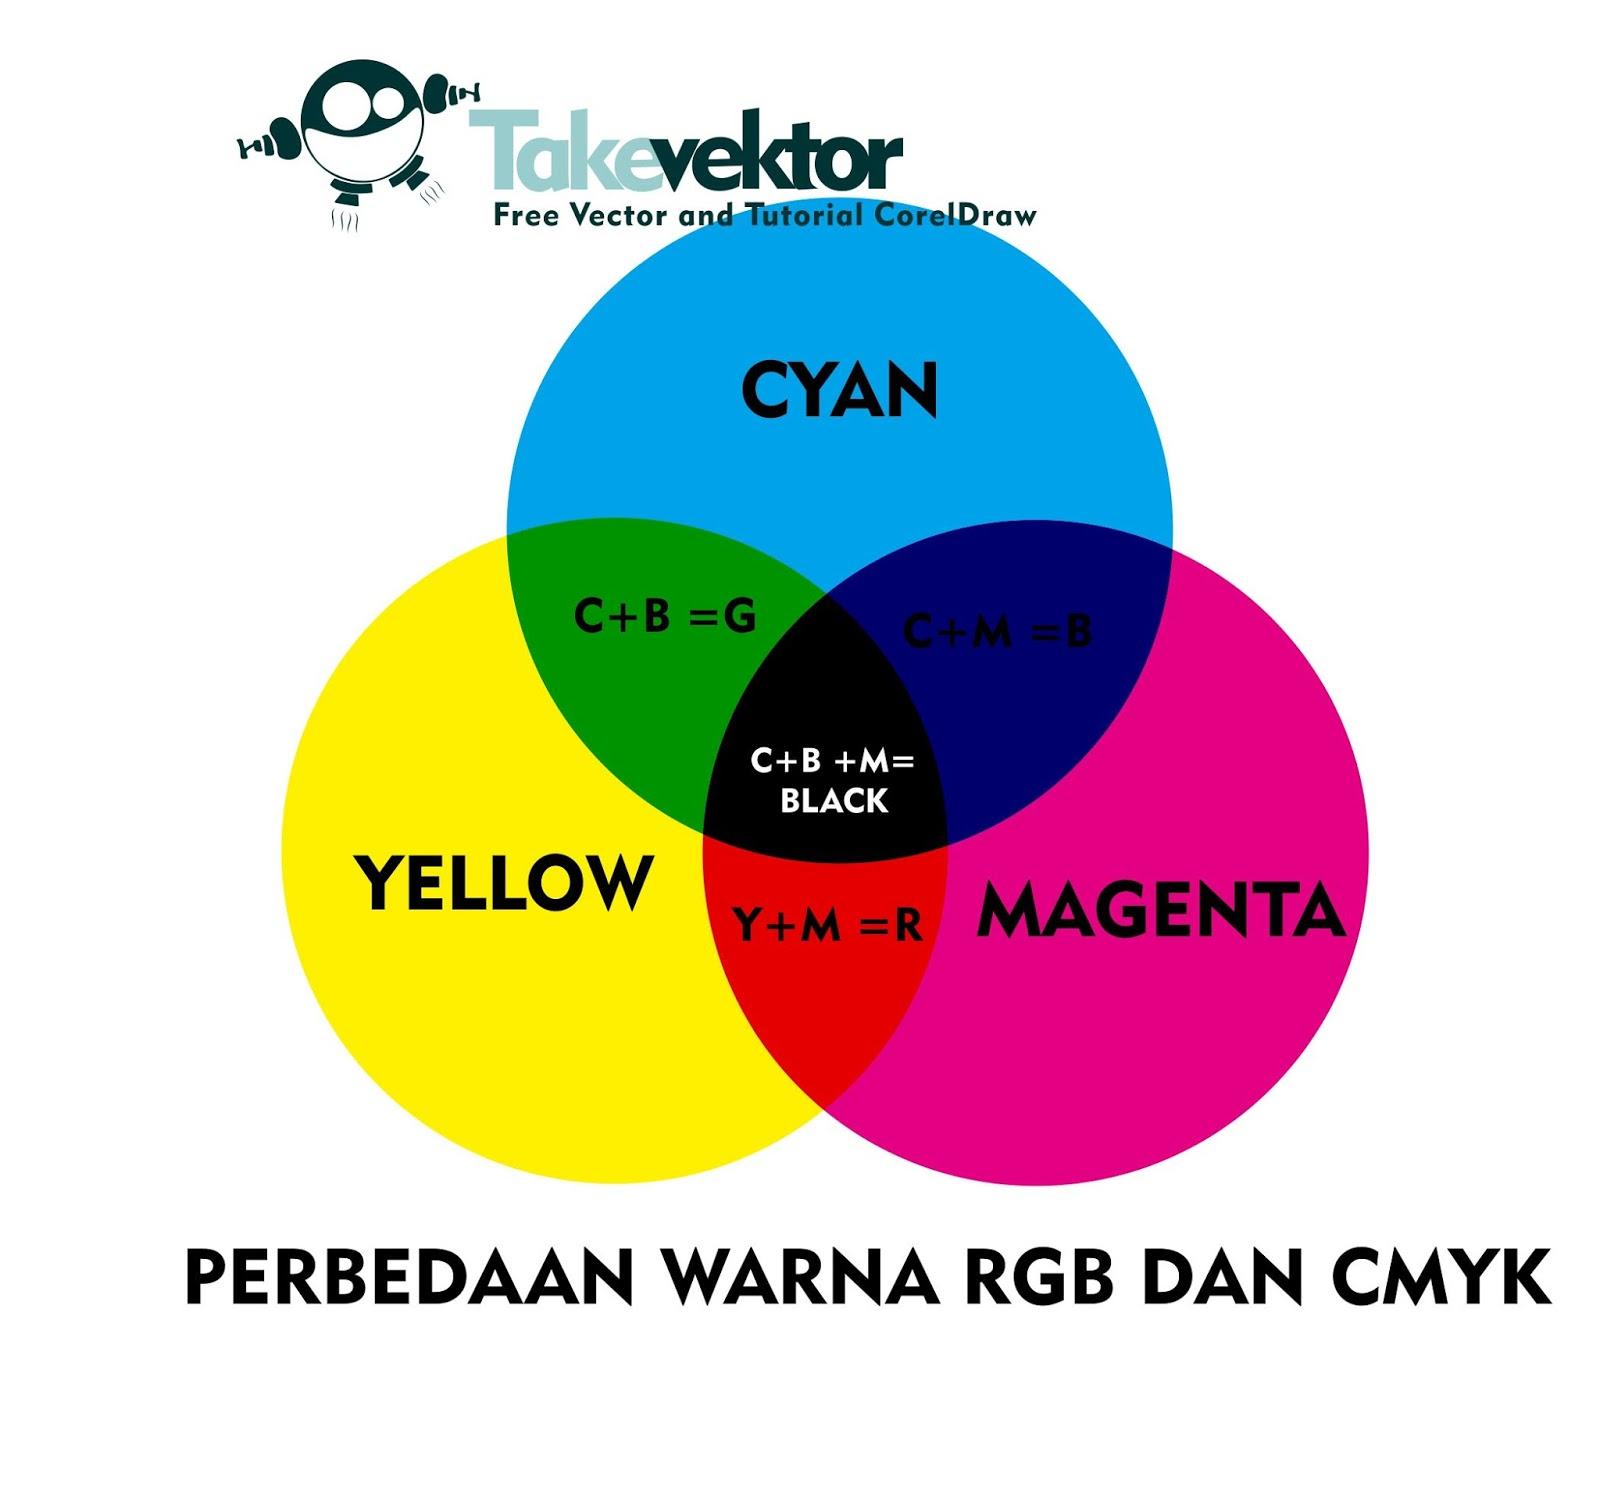 Perbedaan Warna CMYK Dan RGB ~ TakeVektor